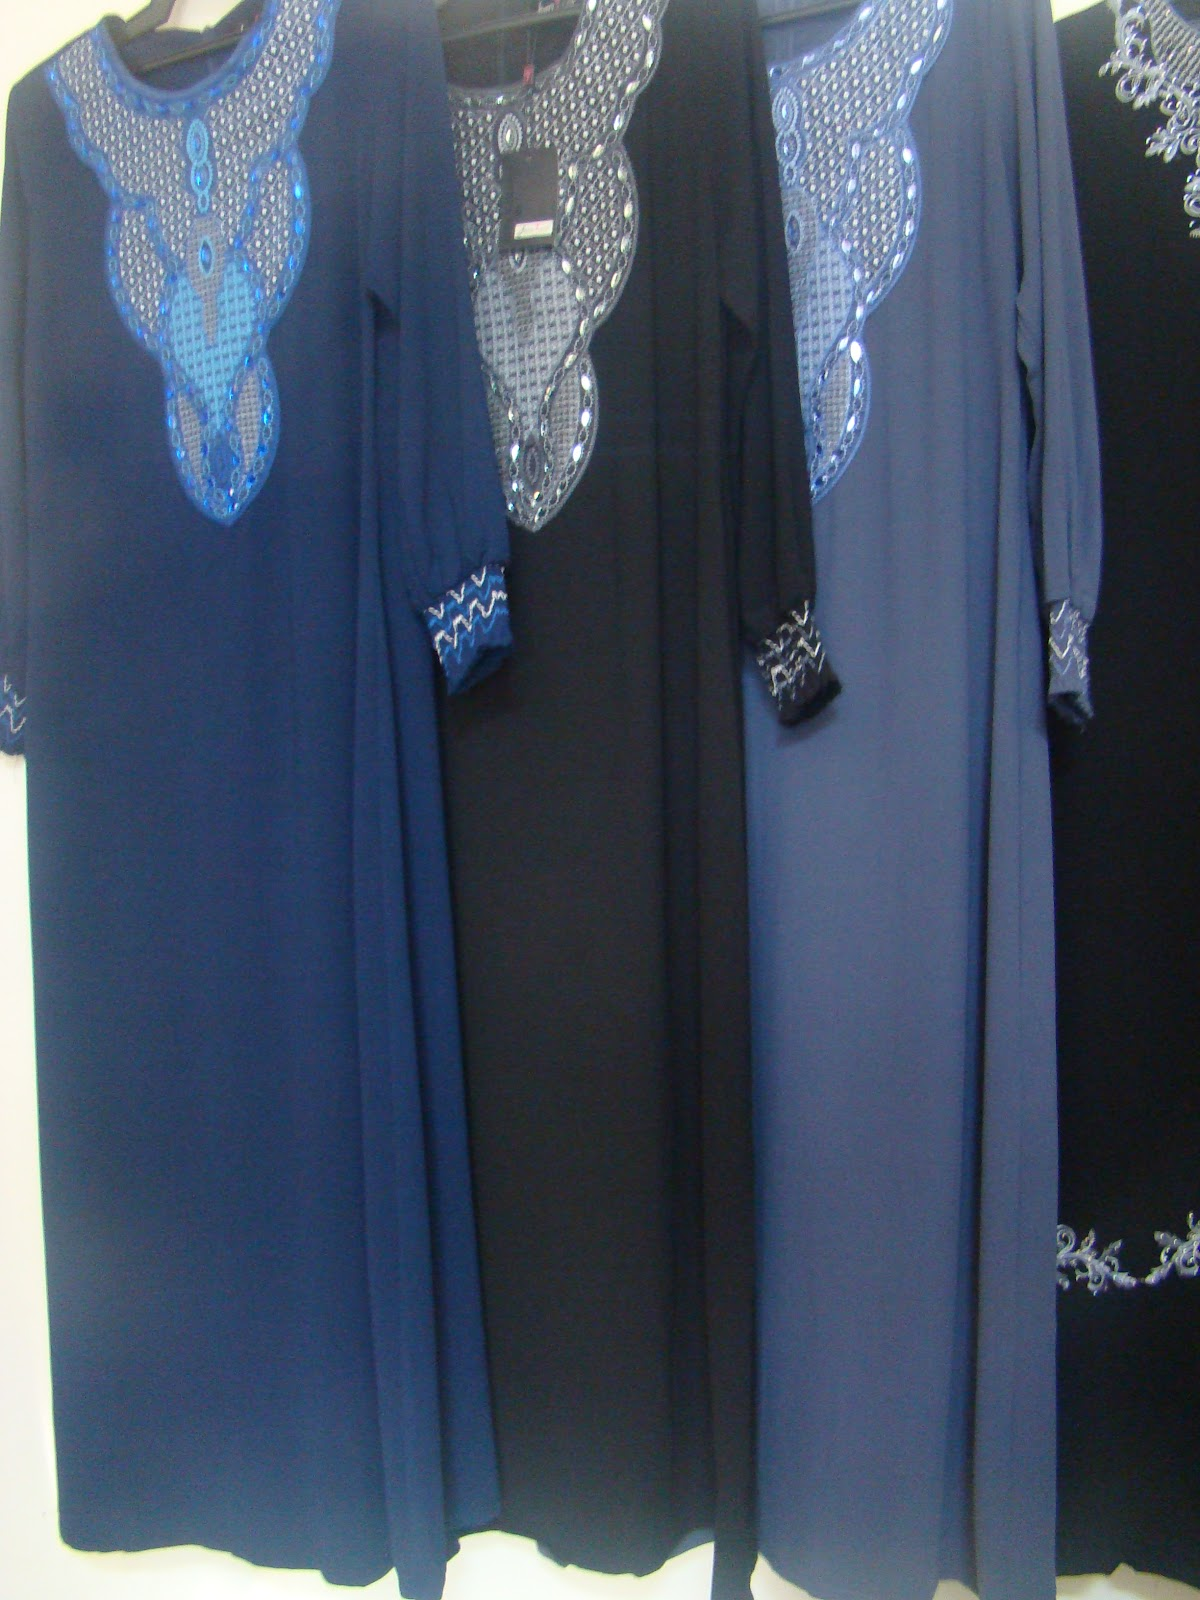 Warna Kelabu Biru Desainrumahid